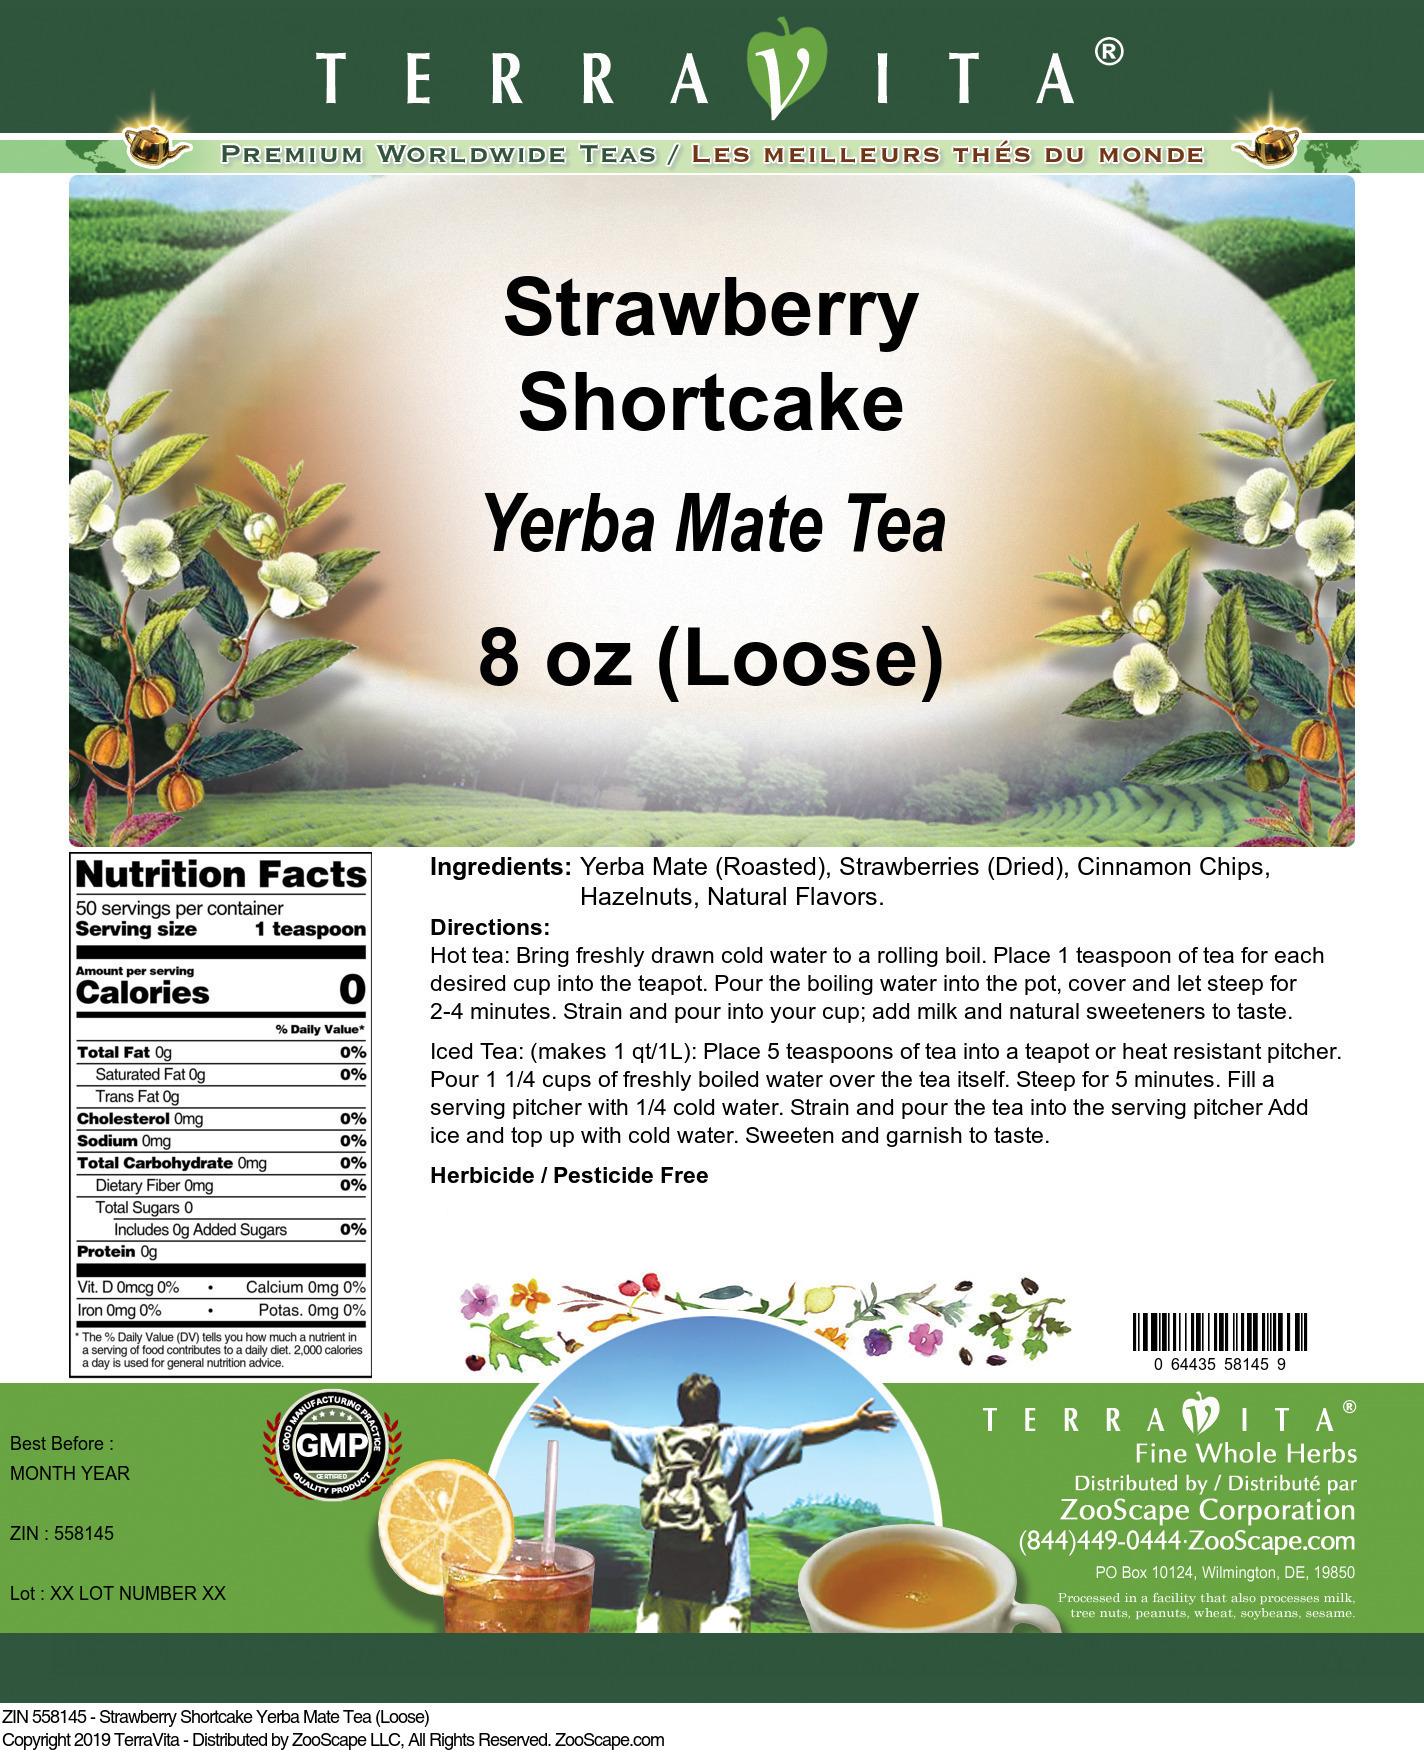 Strawberry Shortcake Yerba Mate Tea (Loose)